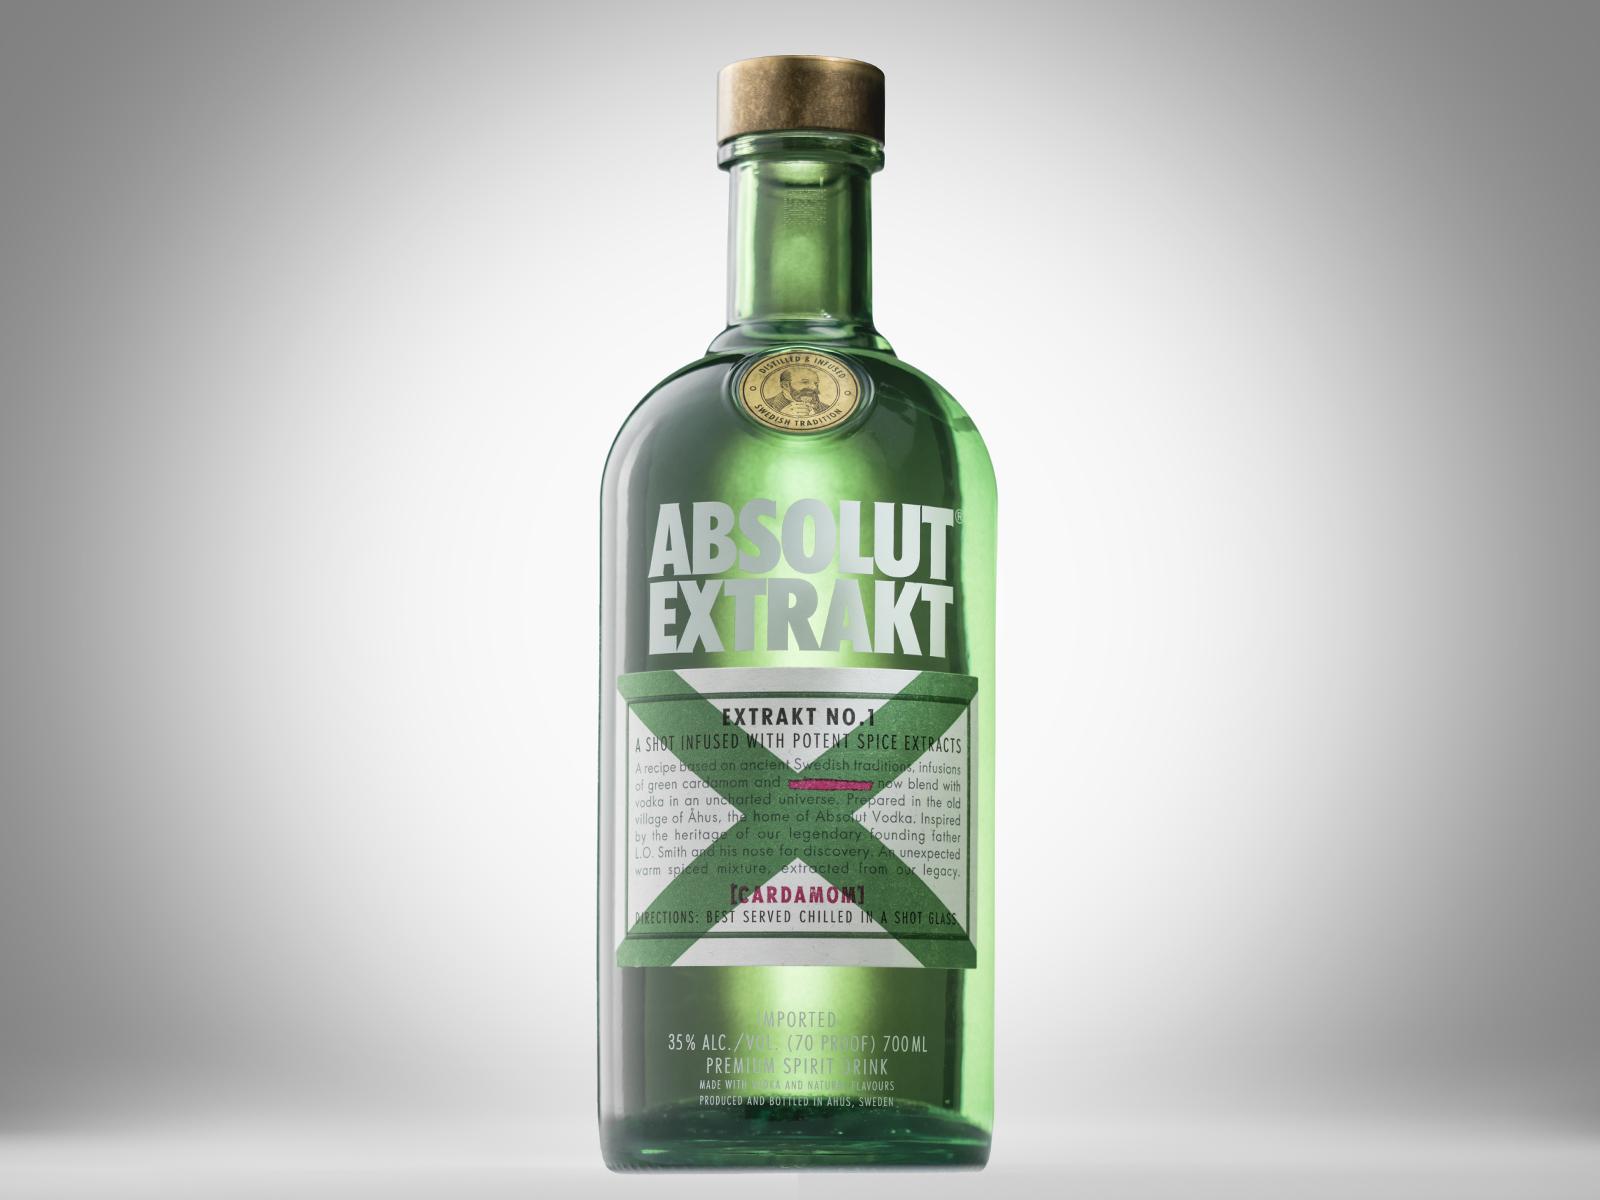 bottle of absolutt extrakt